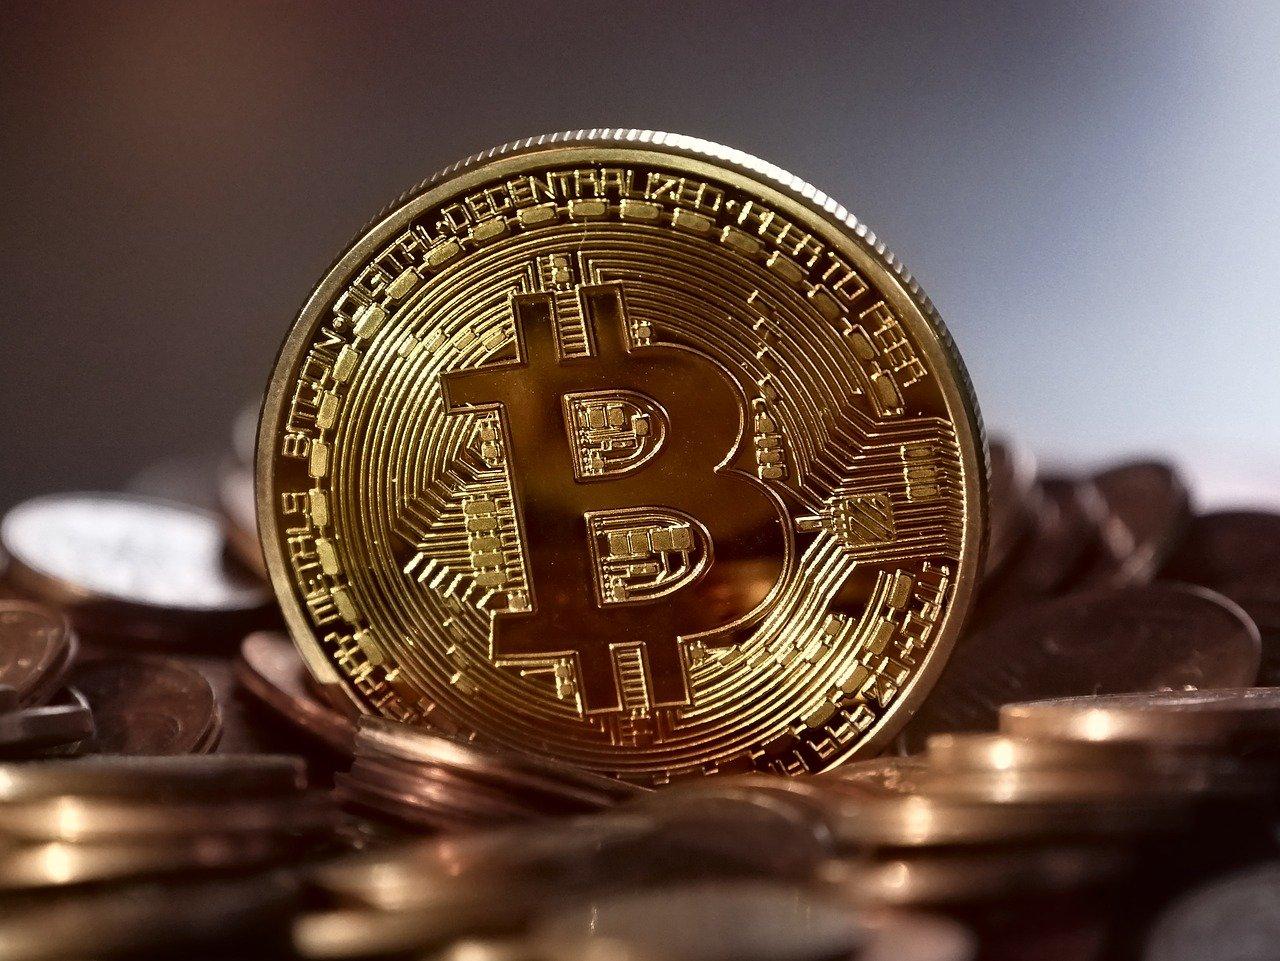 Acheter une Tesla en bitcoin, c'est maintenant possible